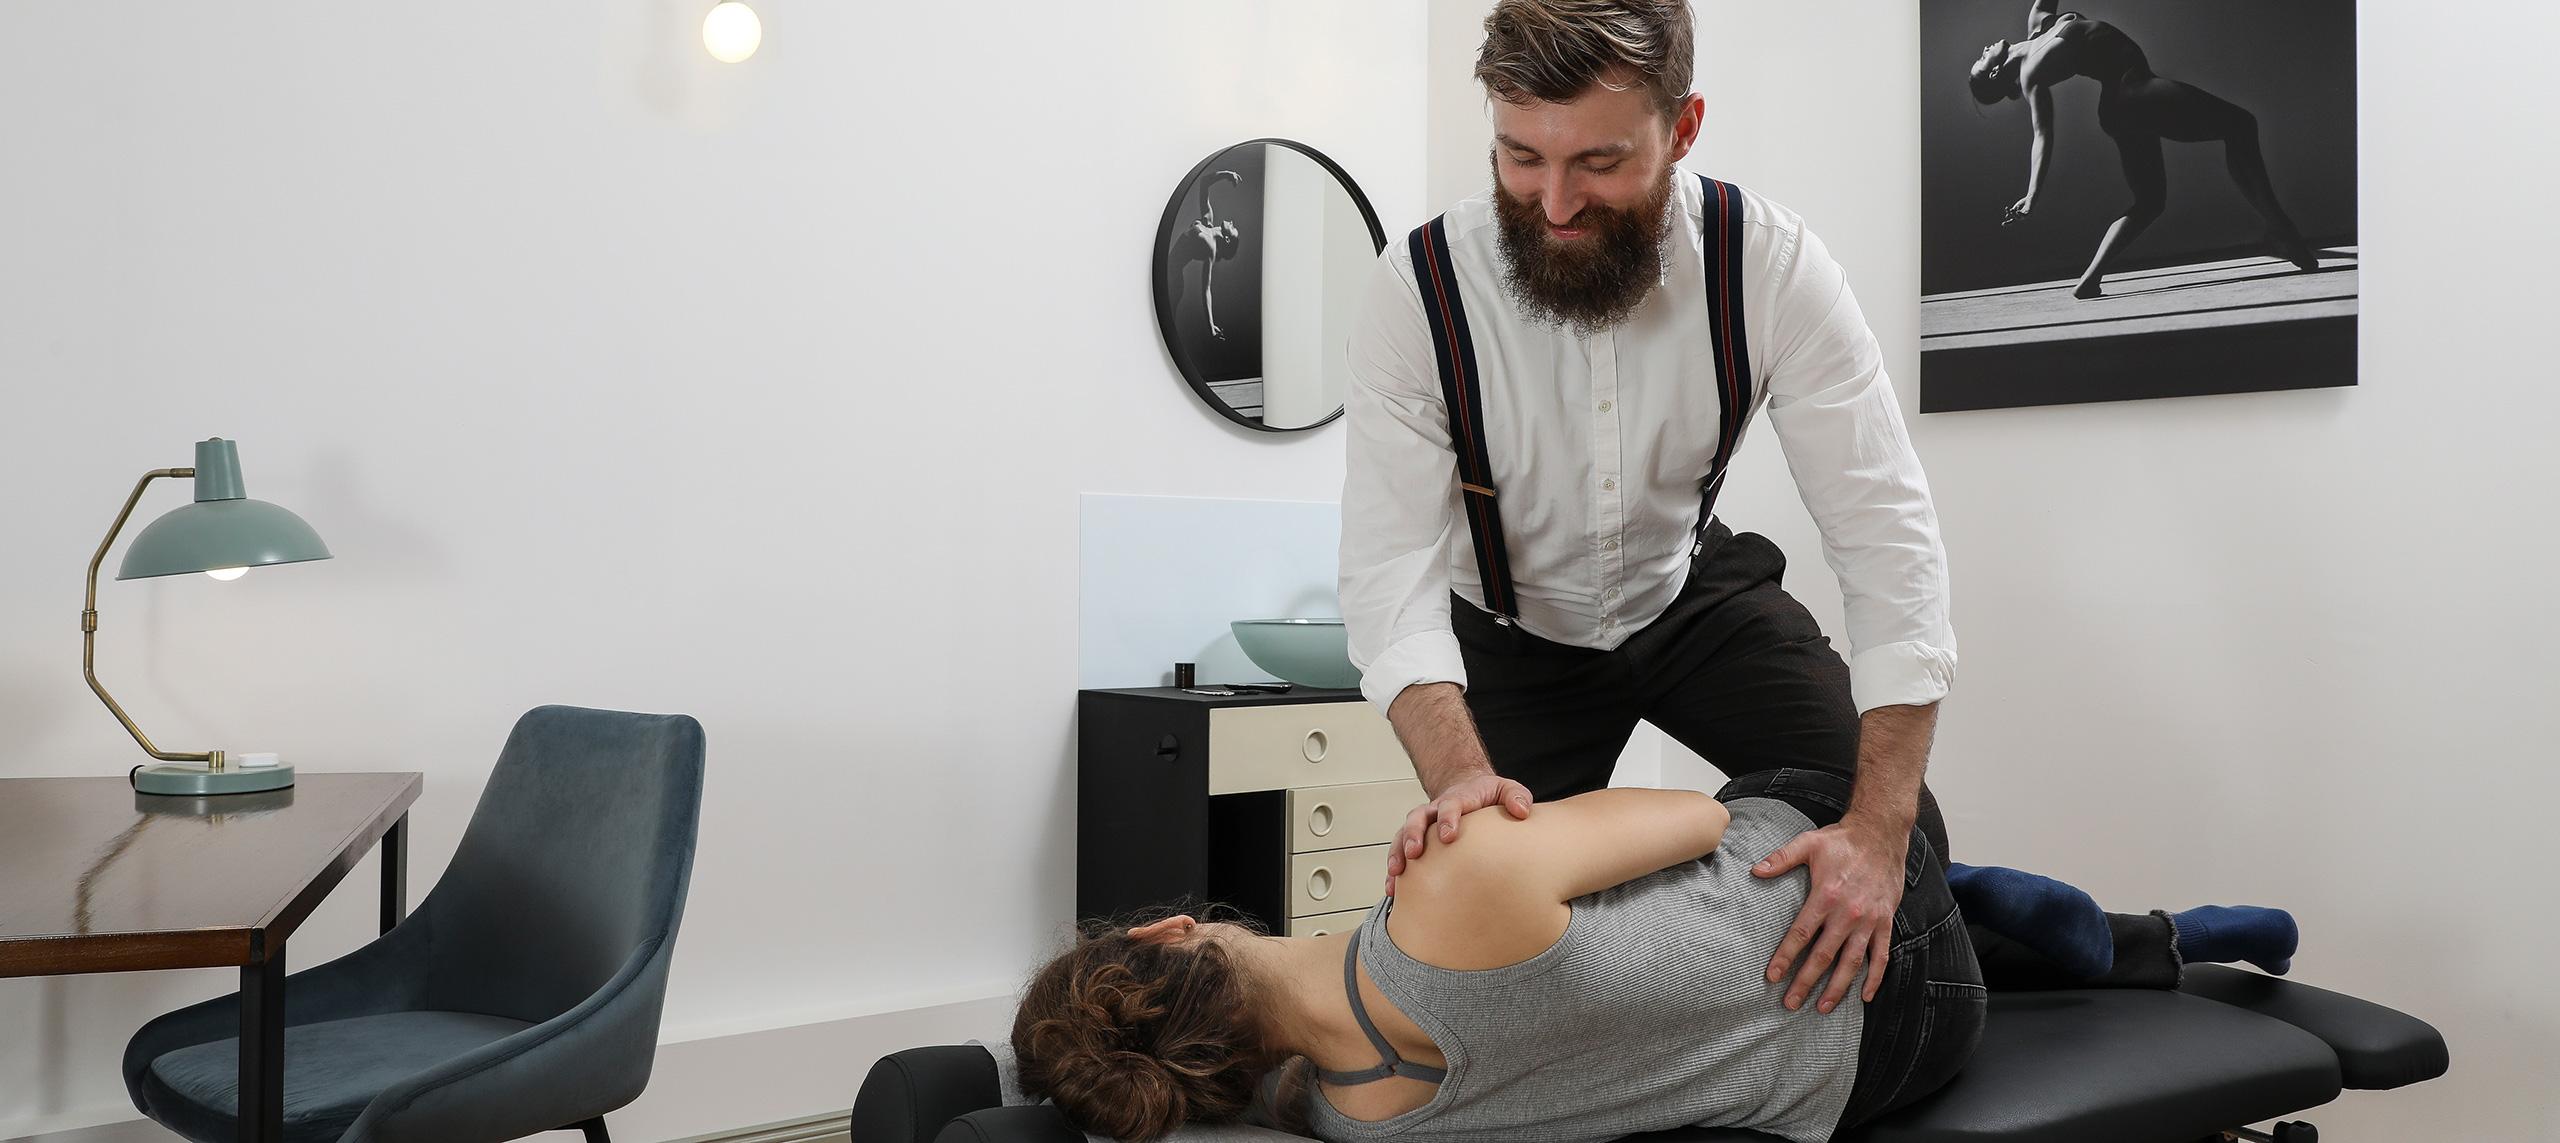 Chirohouse Chiropractor Berlin treats sciatica, sciatic nerve, sciatic pain and chronic lower back pain - www.chirohouse.de - Berlin Mitte